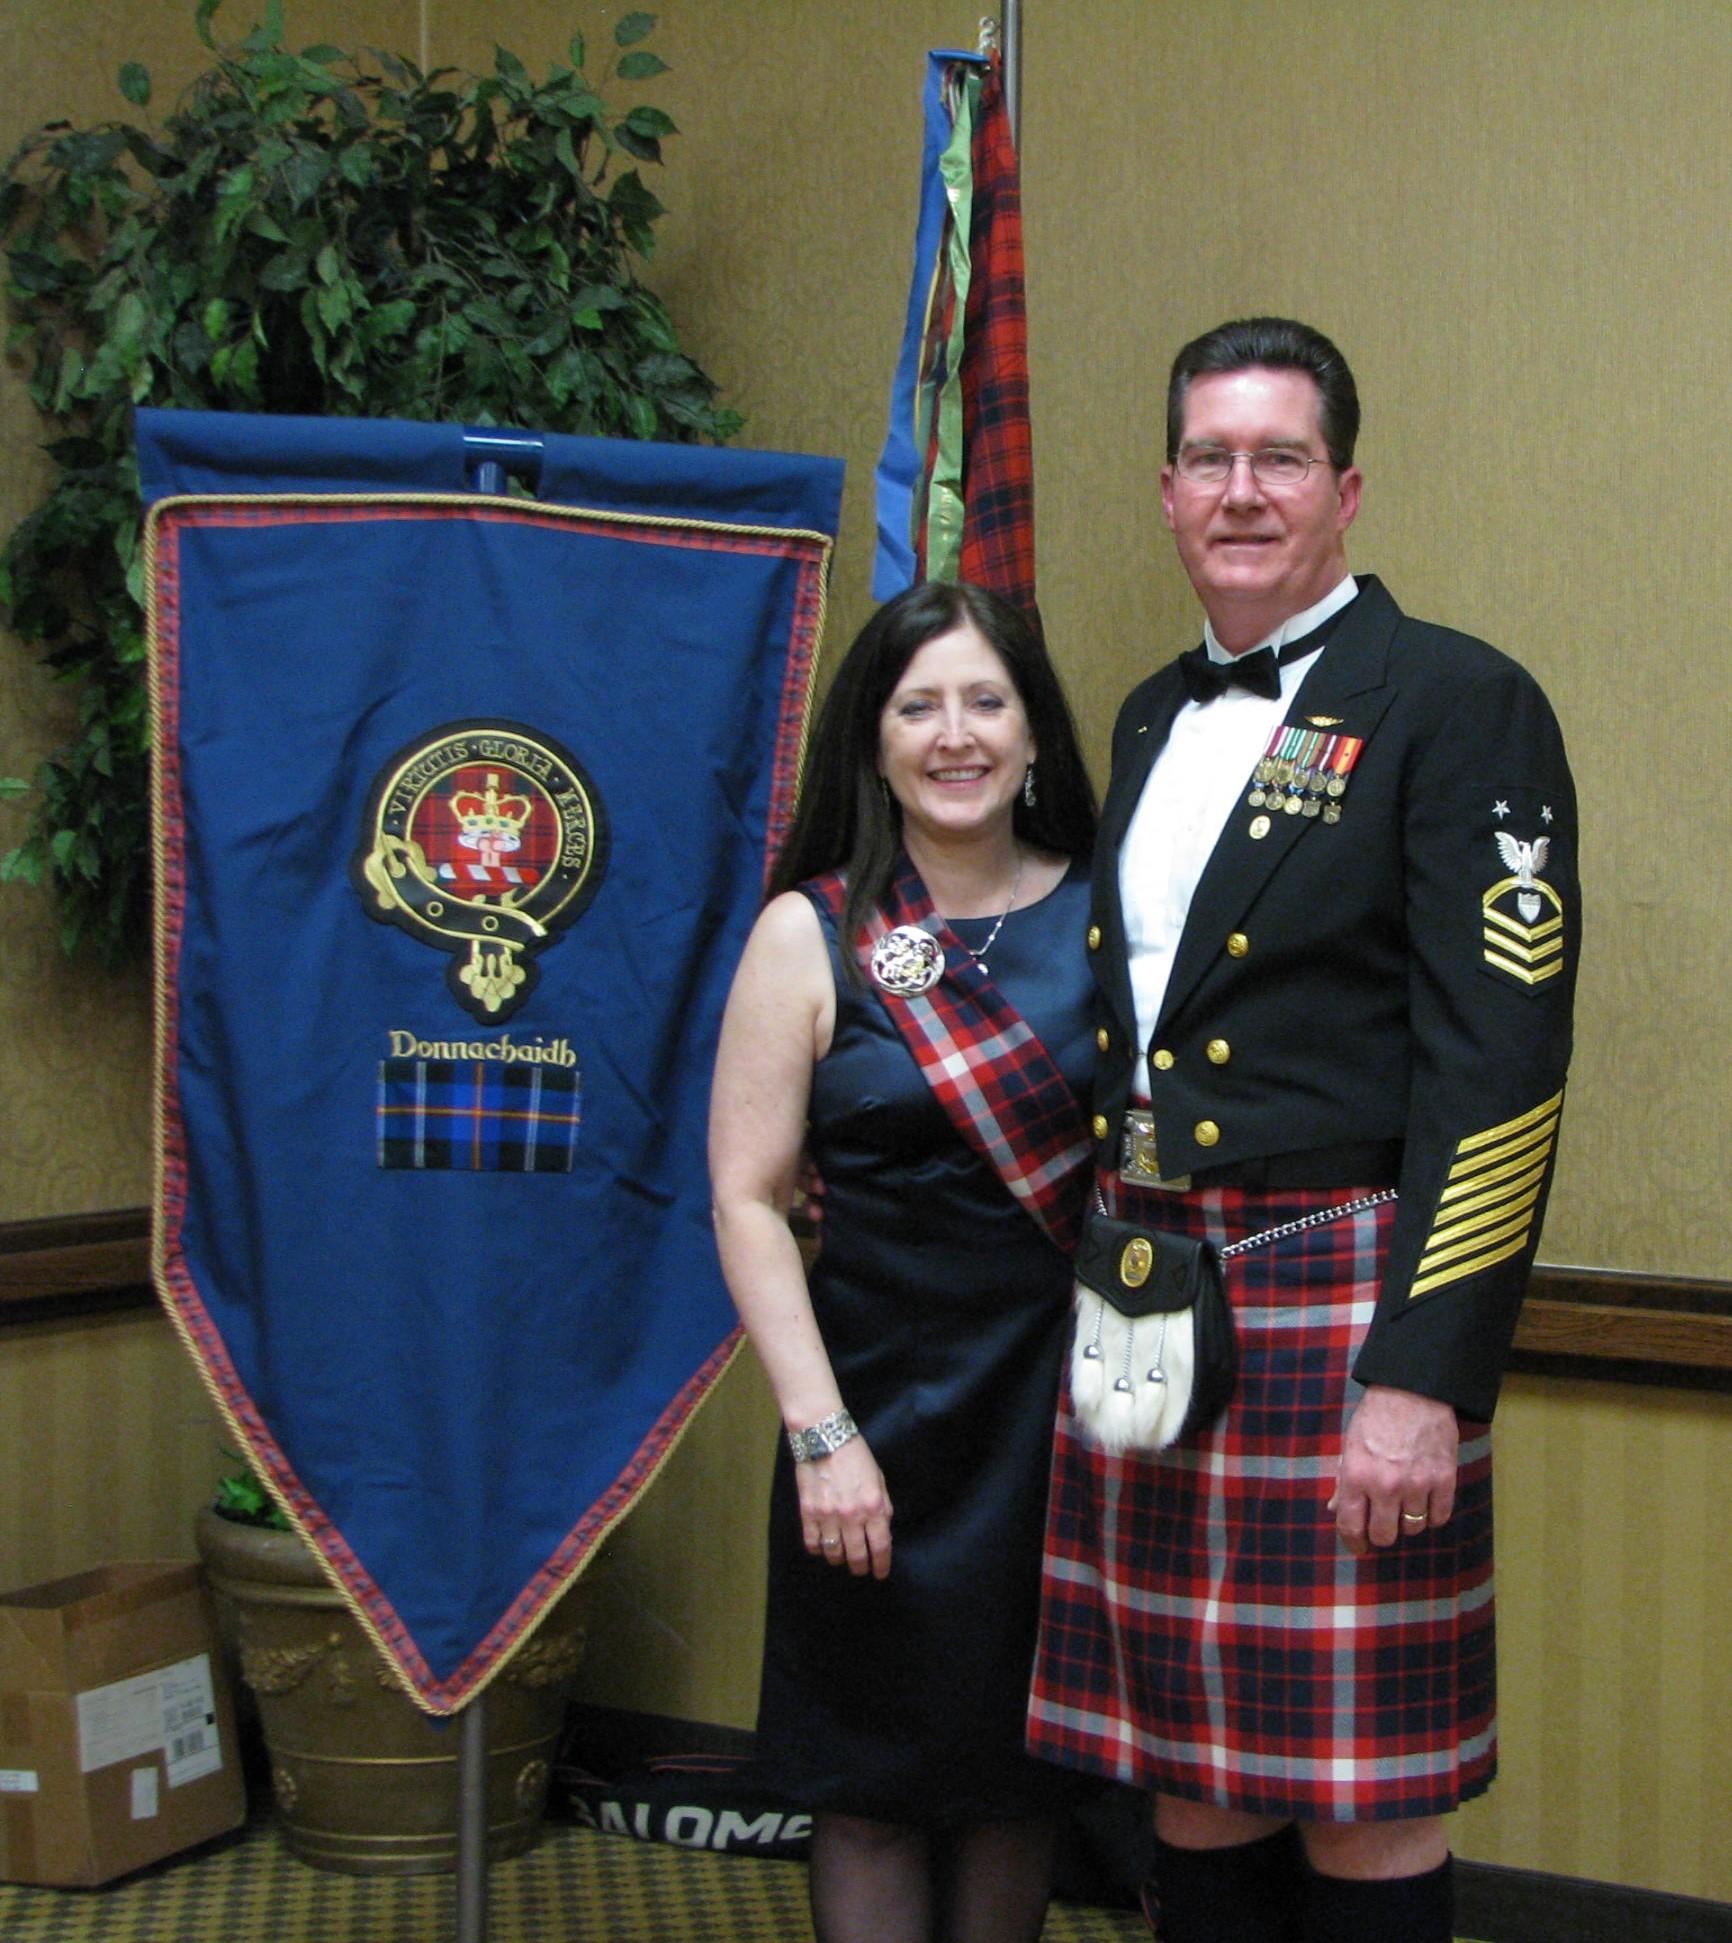 Denise & Mark Thomas in his Coast Guard Dress Mess Uniform & Kilt